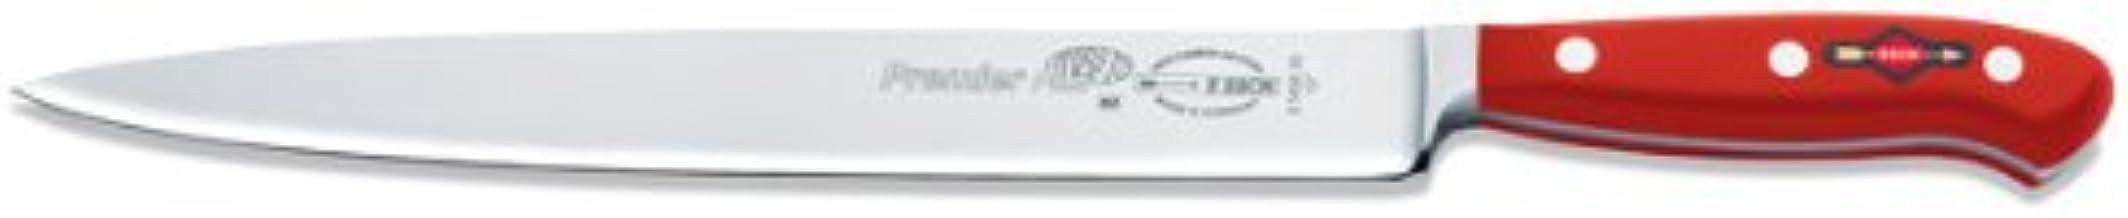 F. Dick Premier Plus HACCP 10-Inch Slicer